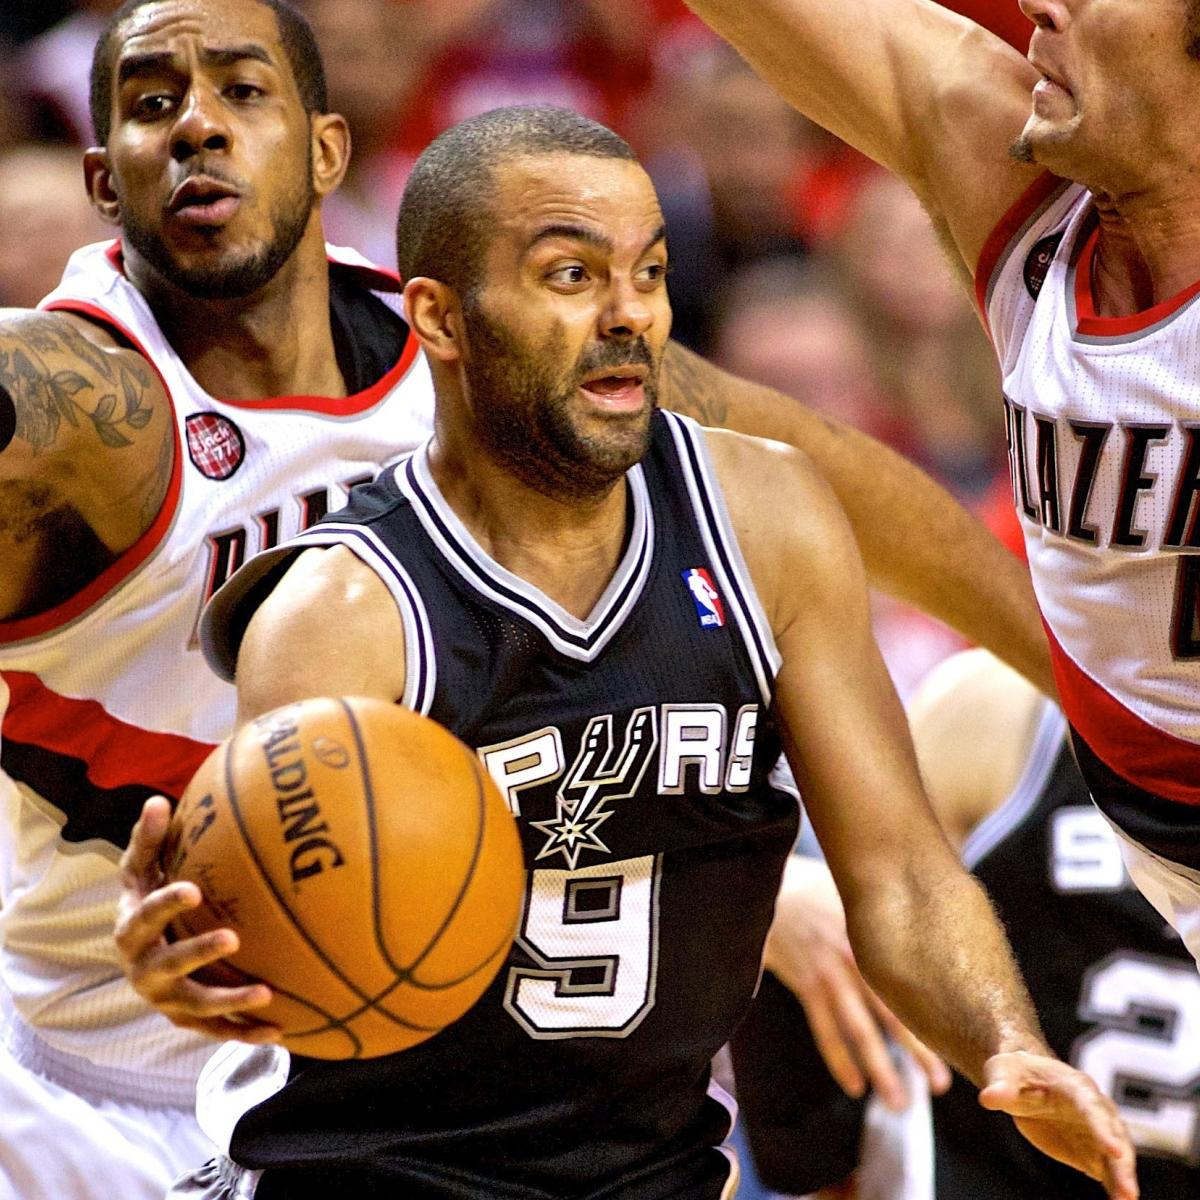 Portland Blazers Live Score: San Antonio Spurs Vs. Portland Trail Blazers: Live Score